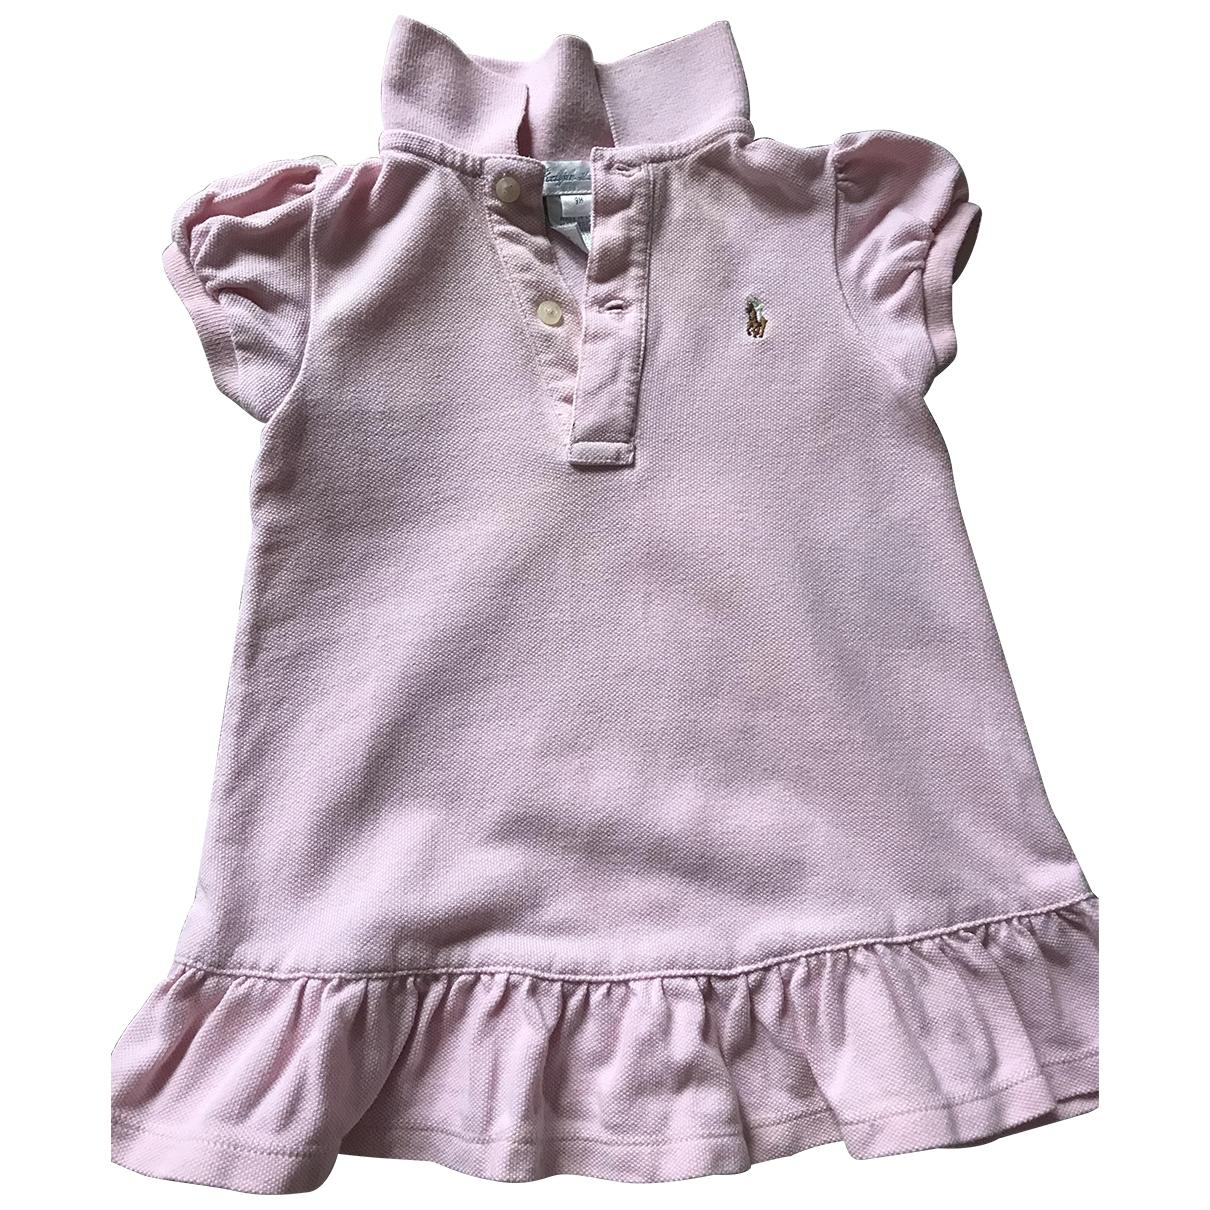 Ralph Lauren \N Pink Cotton dress for Kids 9 months - up to 71cm FR